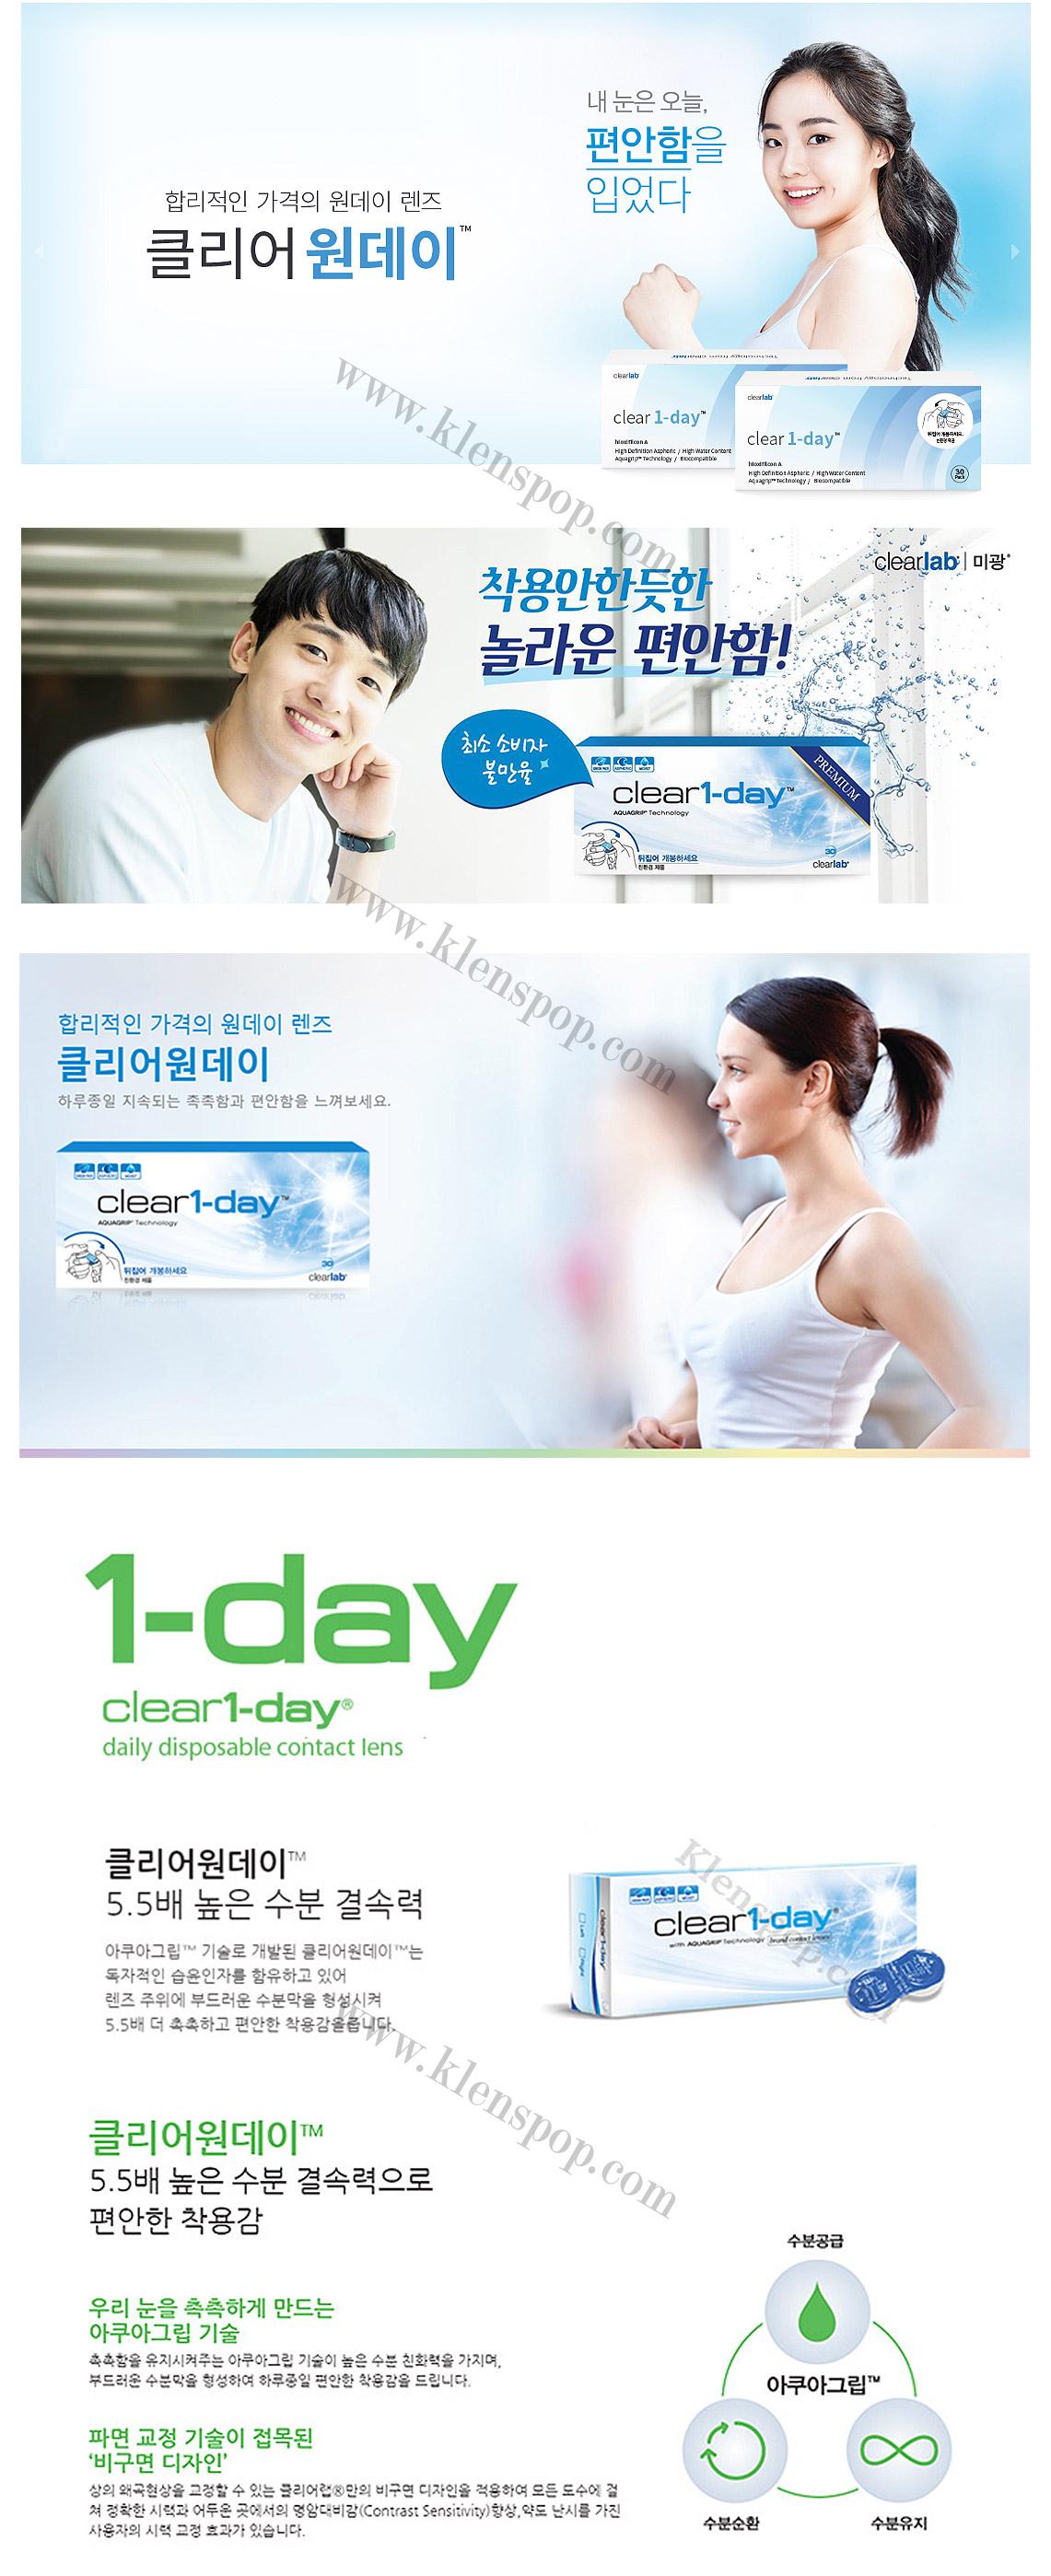 clear-1day-lens-2.jpg